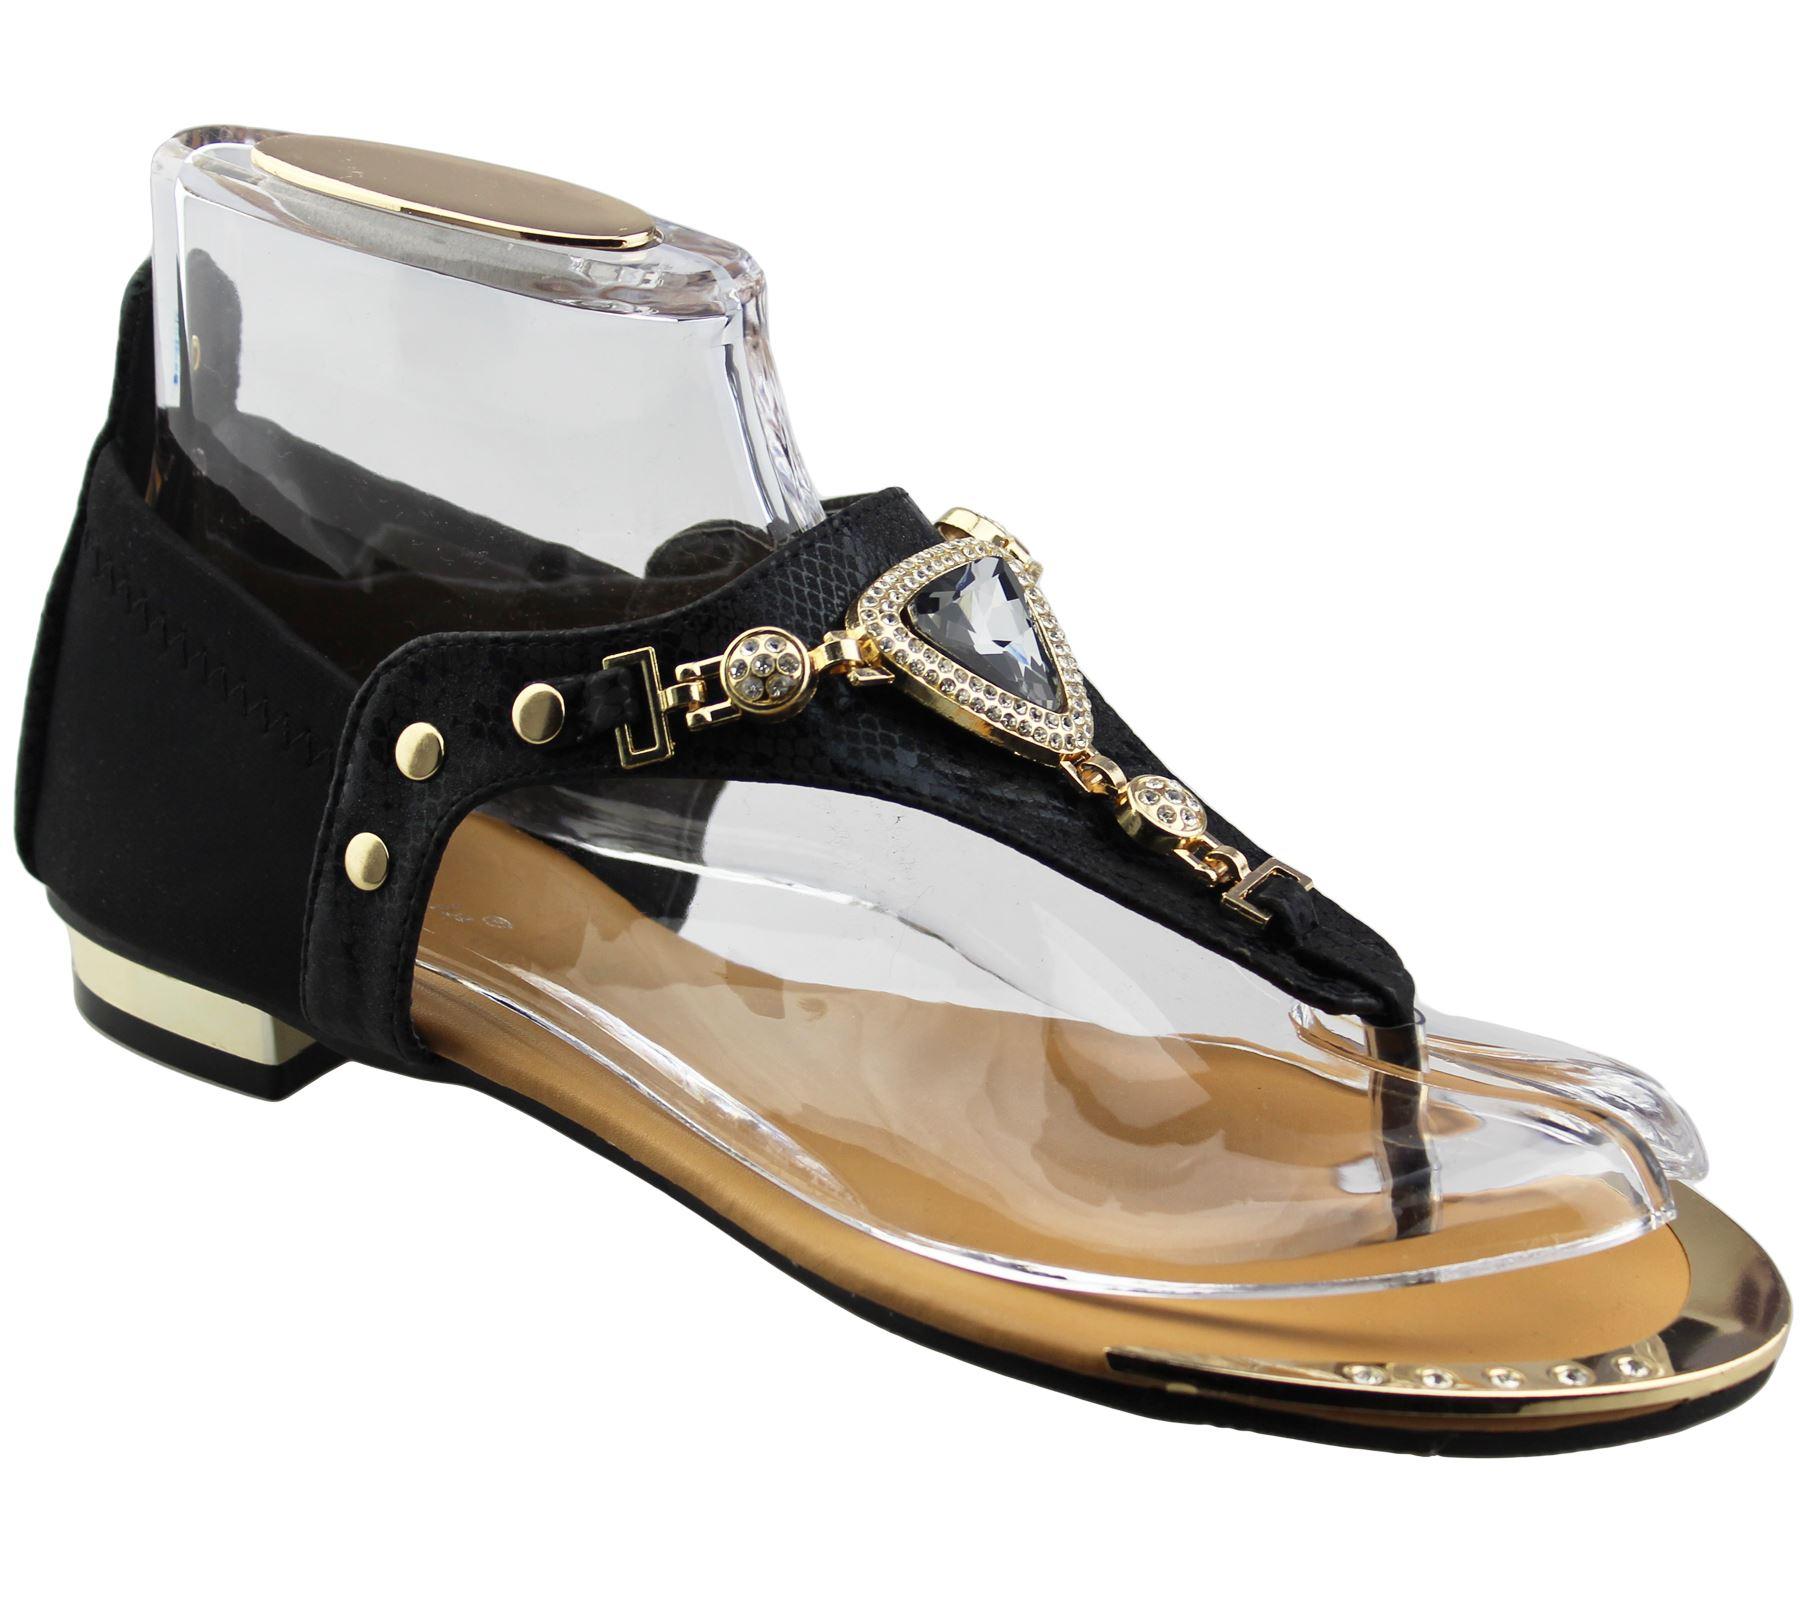 Womens-Flat-Summer-Sandals-Ladies-Diamante-Wedding-Toe-Post-Casual-Slipper thumbnail 4